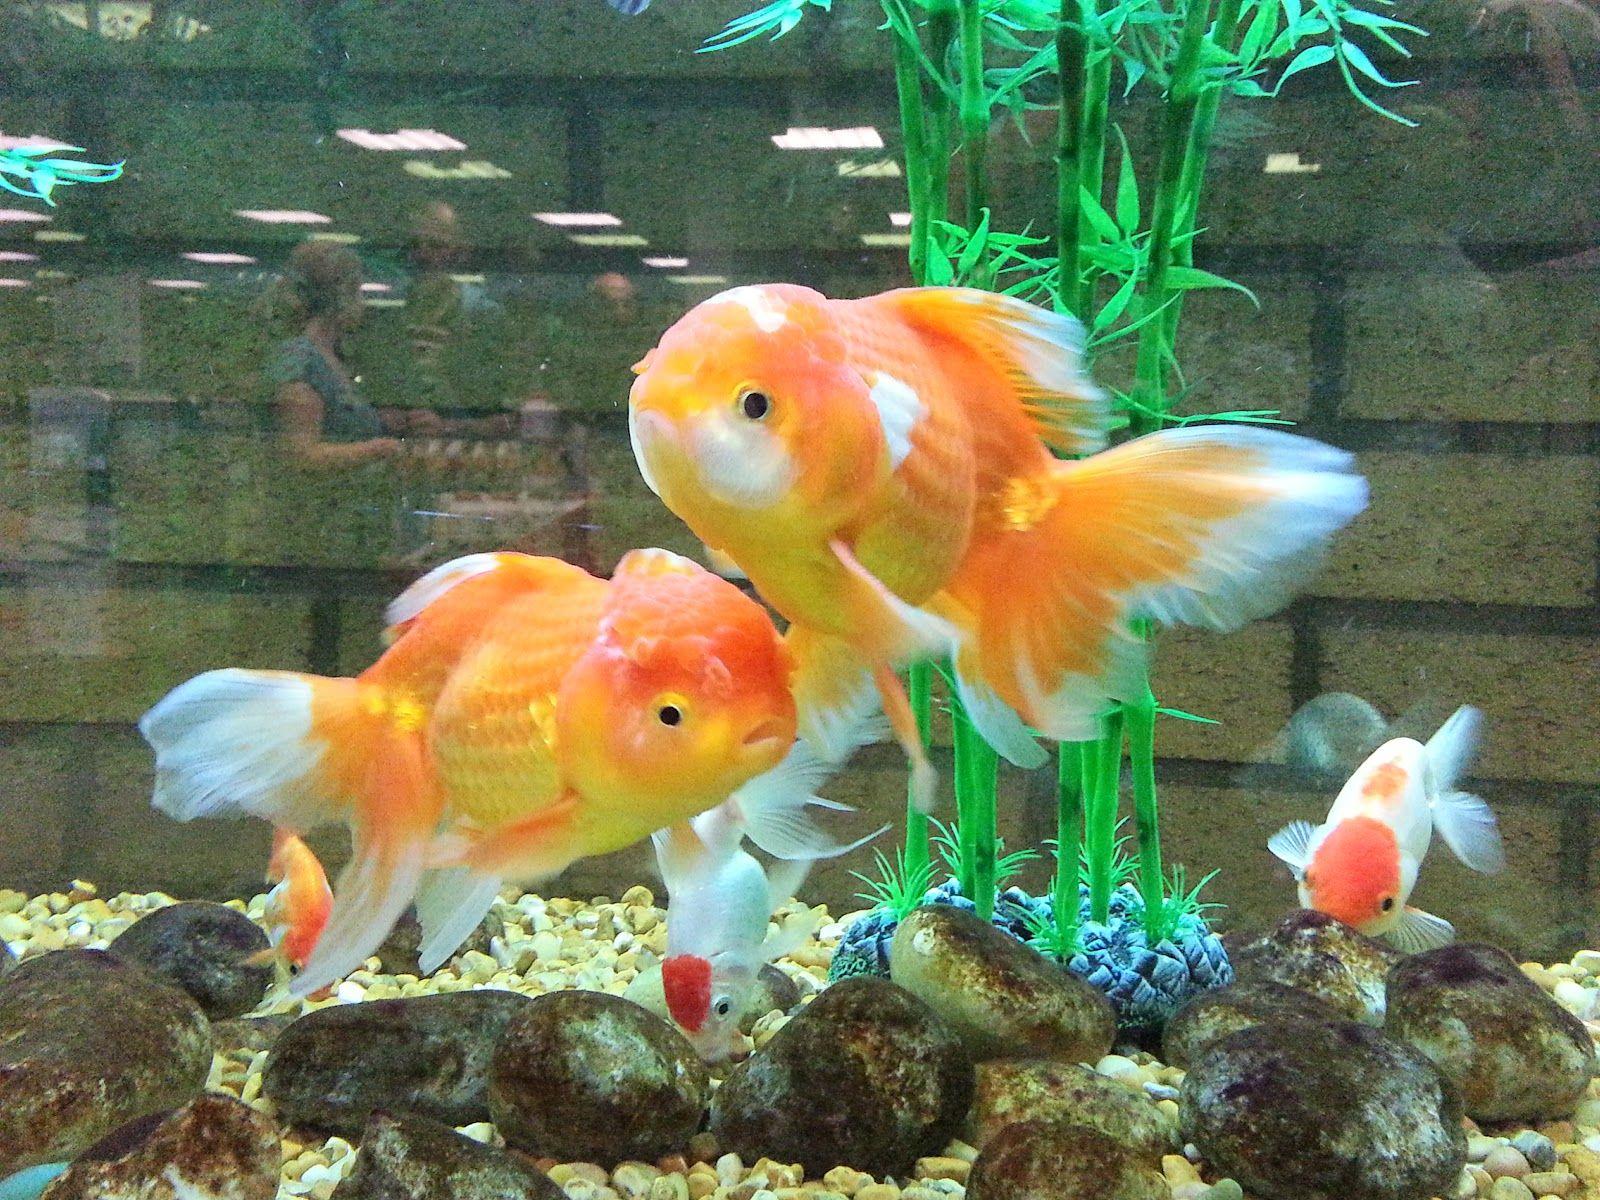 Fish aquarium in bhopal - Fish